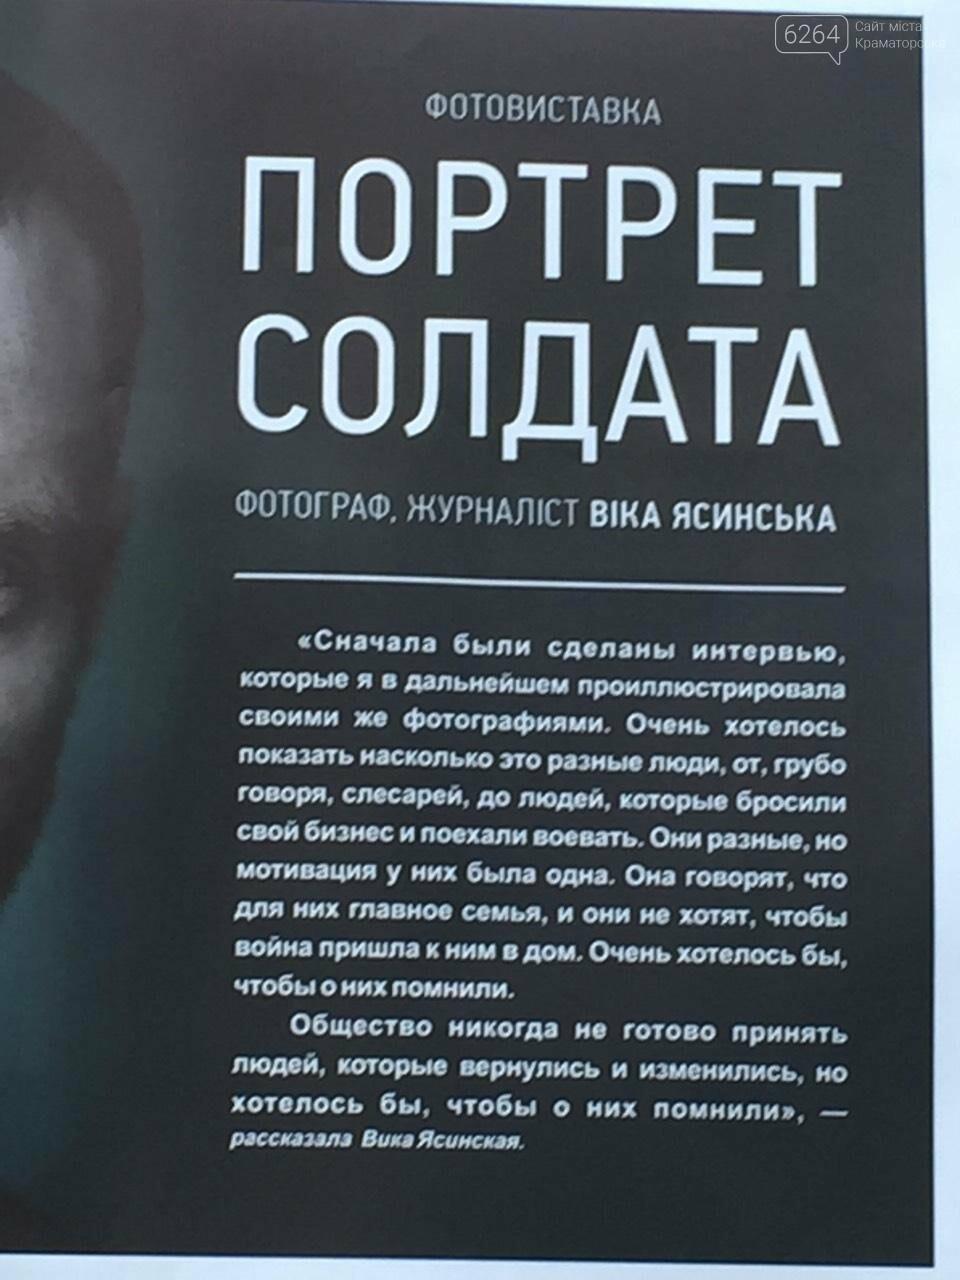 В Краматорске проходит выставка «Портрет солдата», фото-1